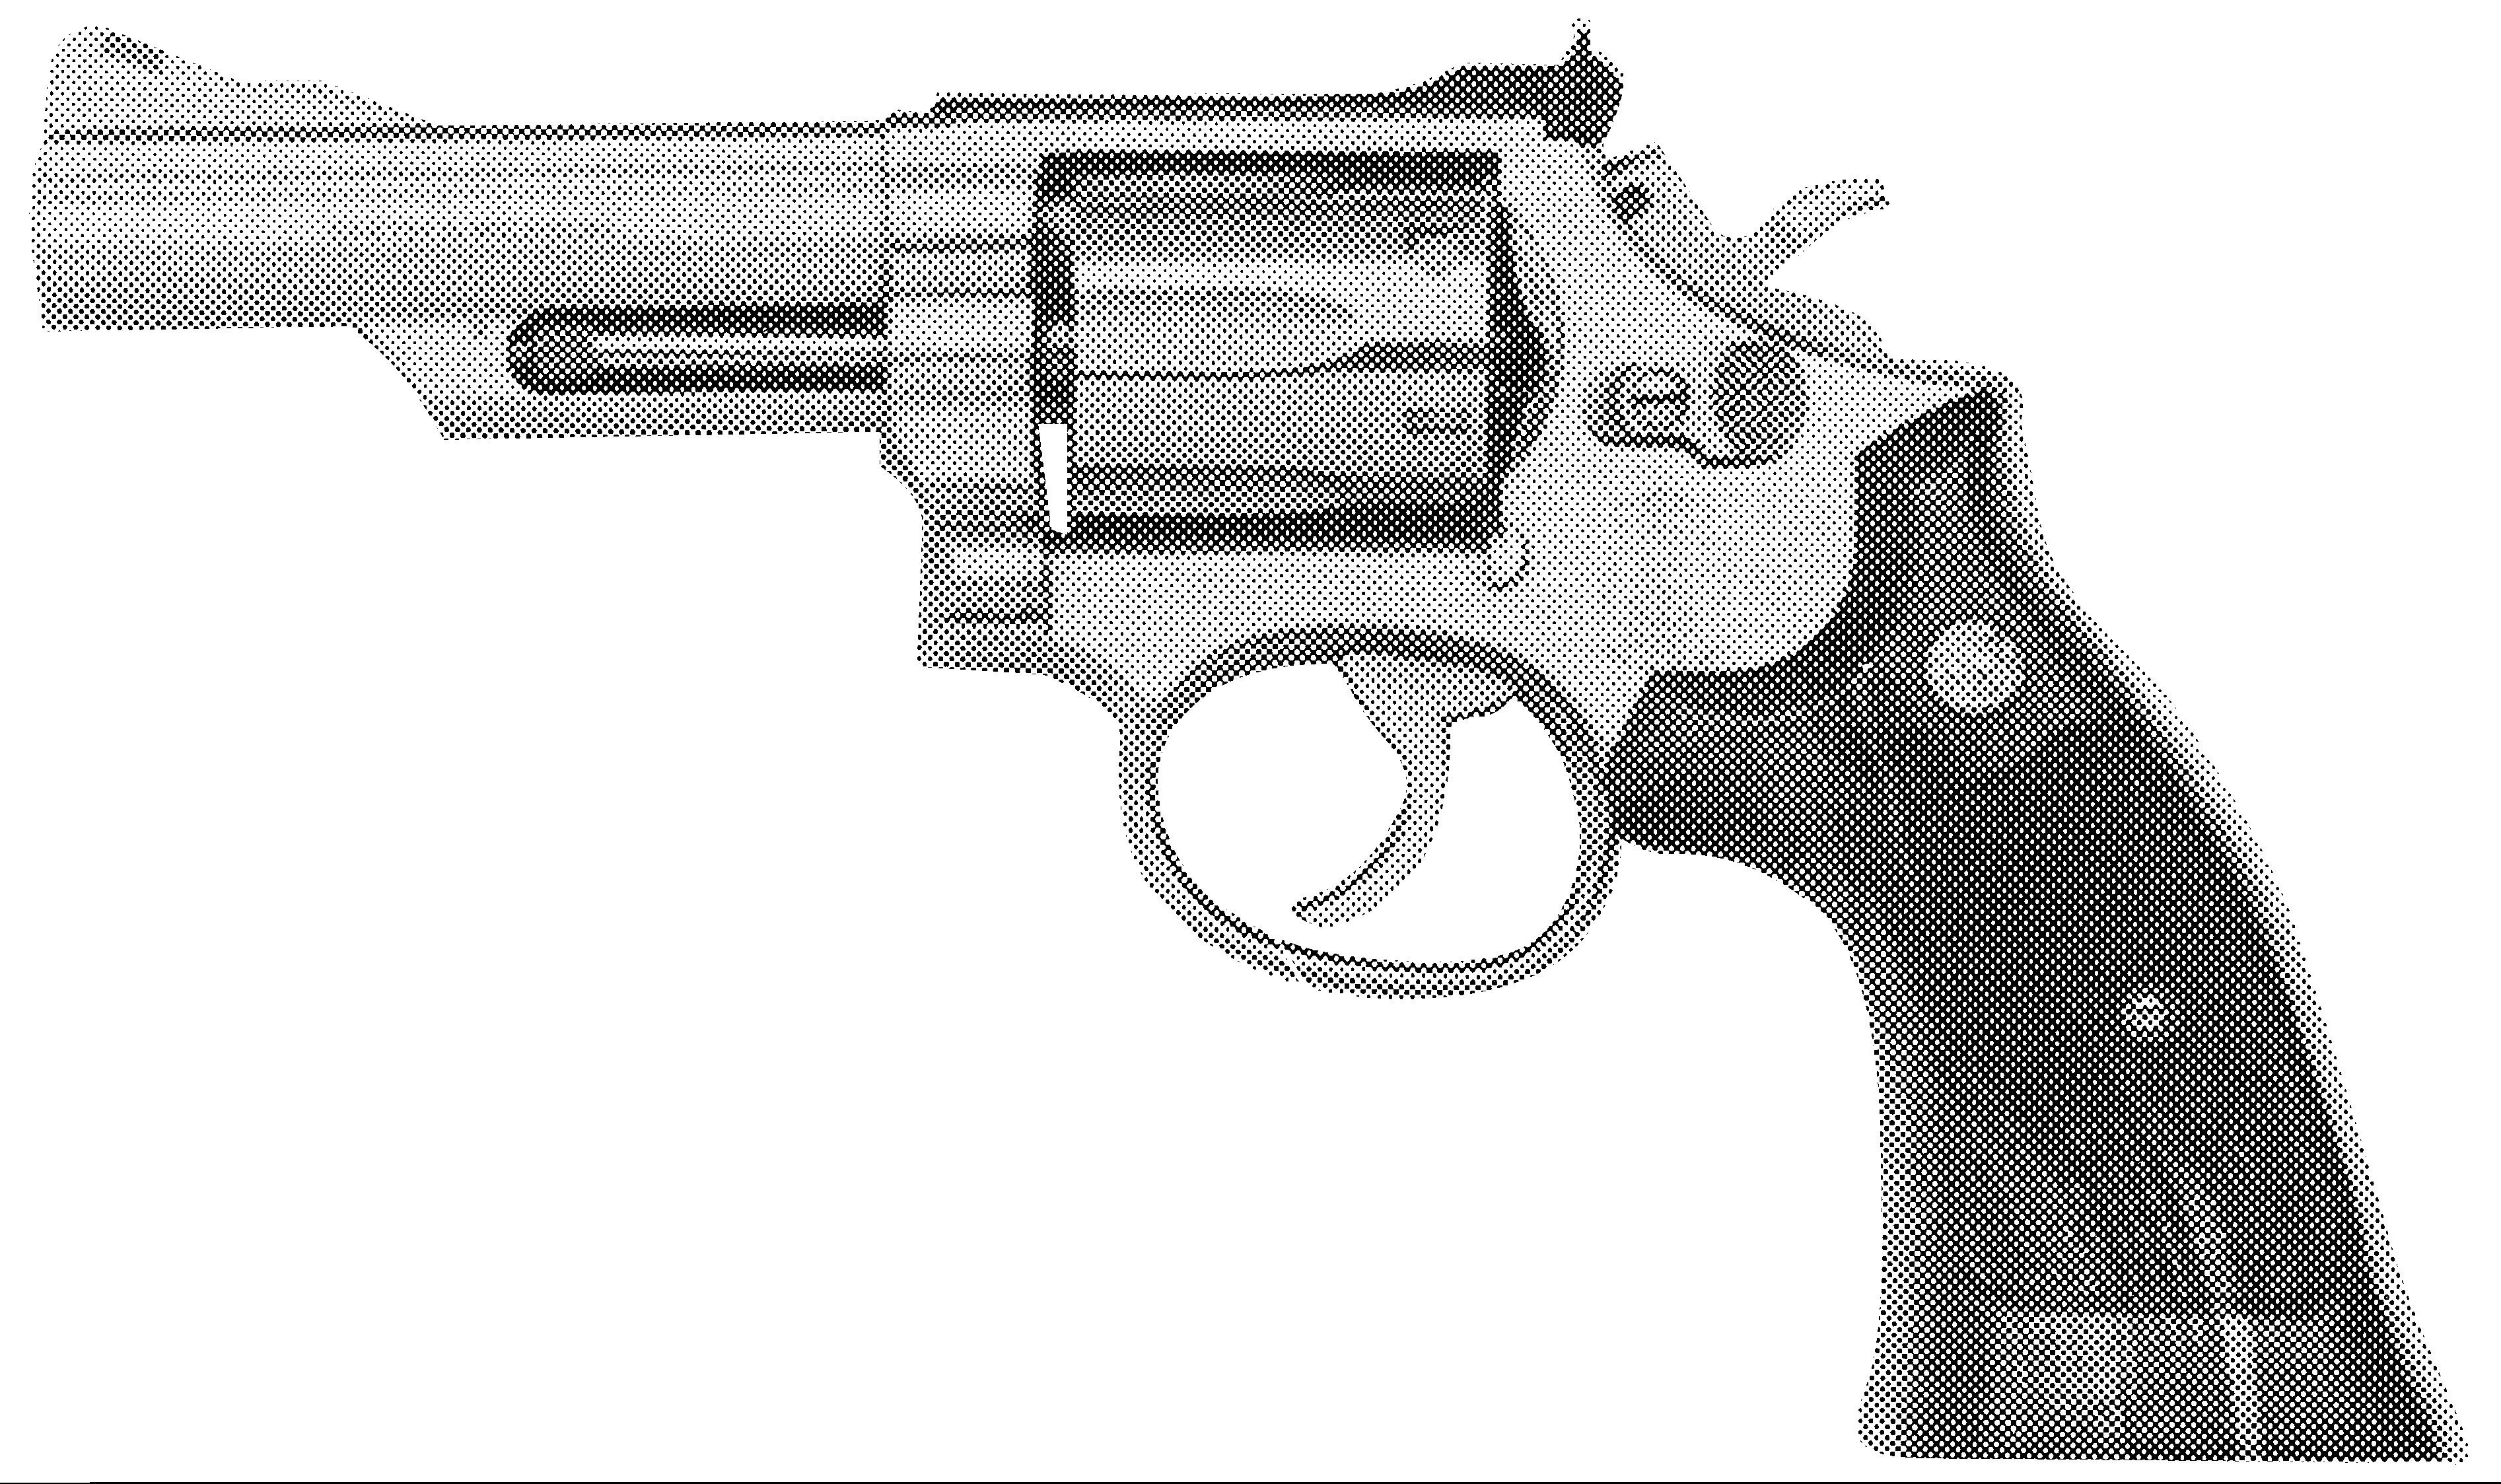 SMITH & WESSON Model 66 .357 Magnum F-Comp :: Gun Values by Gun Digest